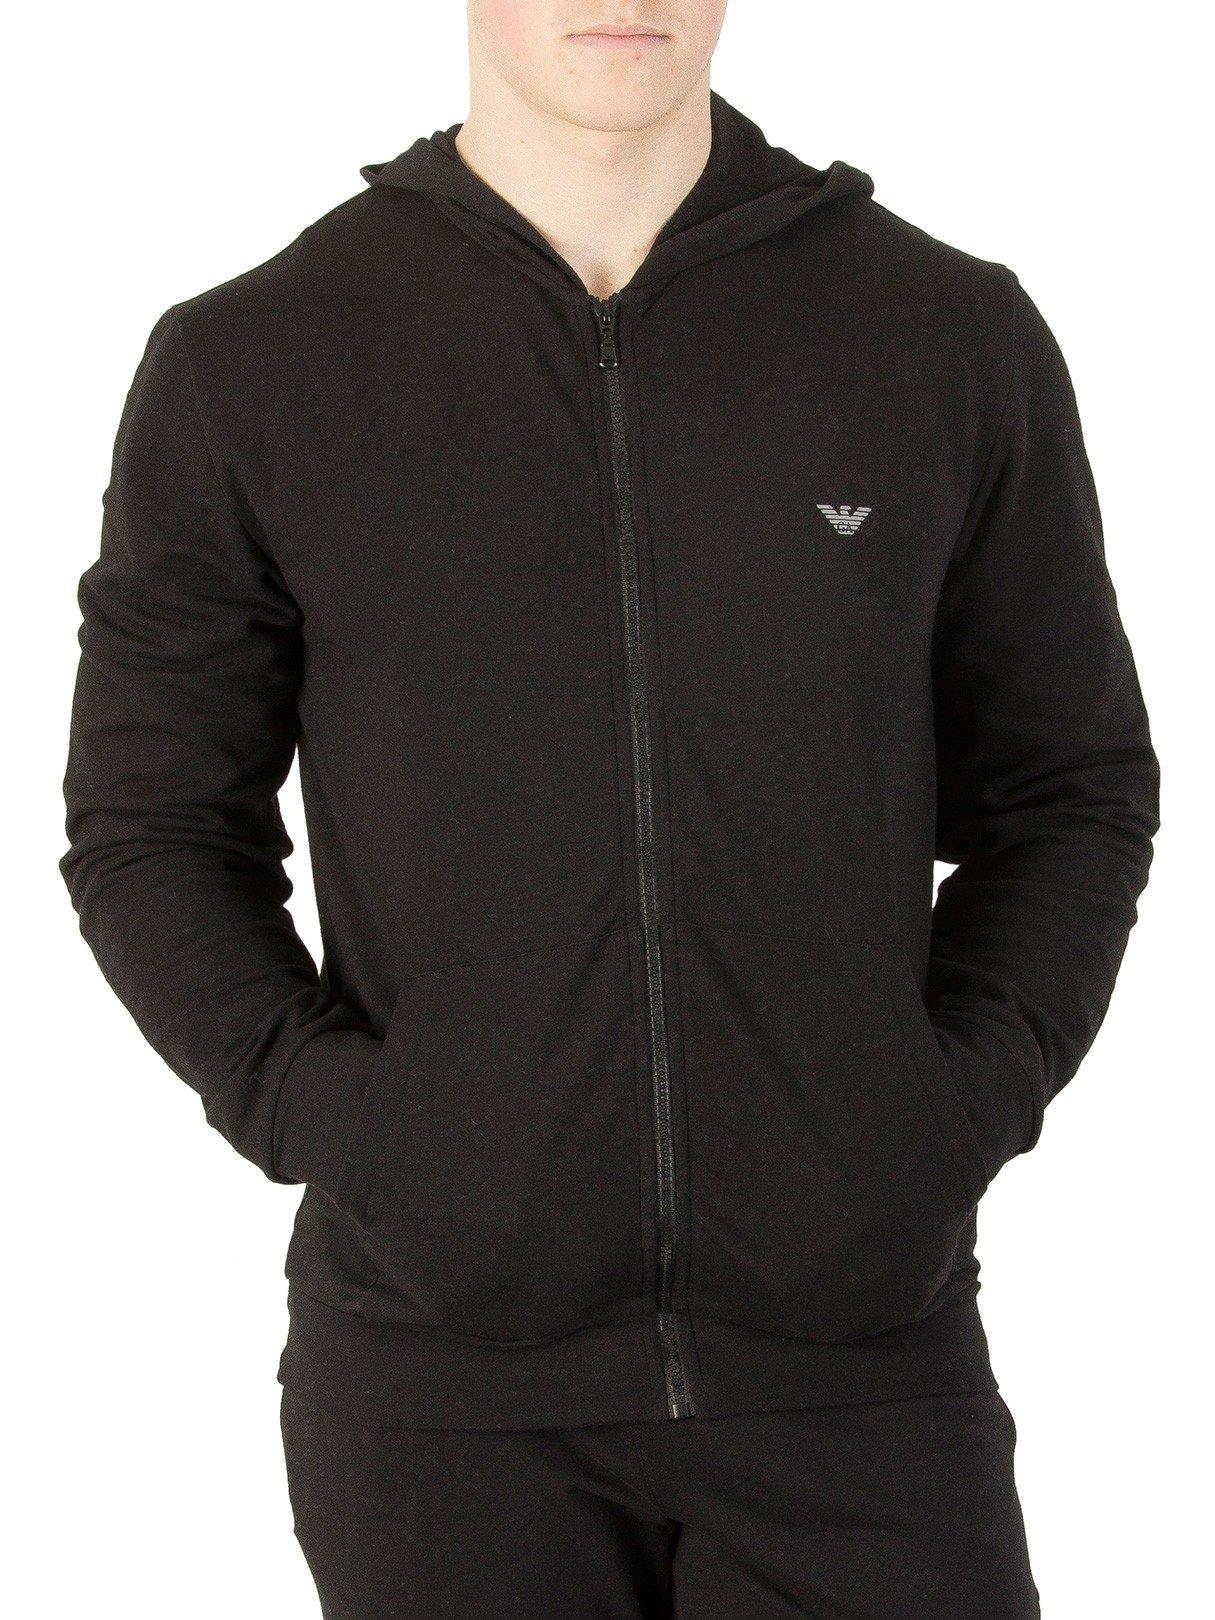 Emporio Armani Men's Logo Zip Hoodie, Black, Medium